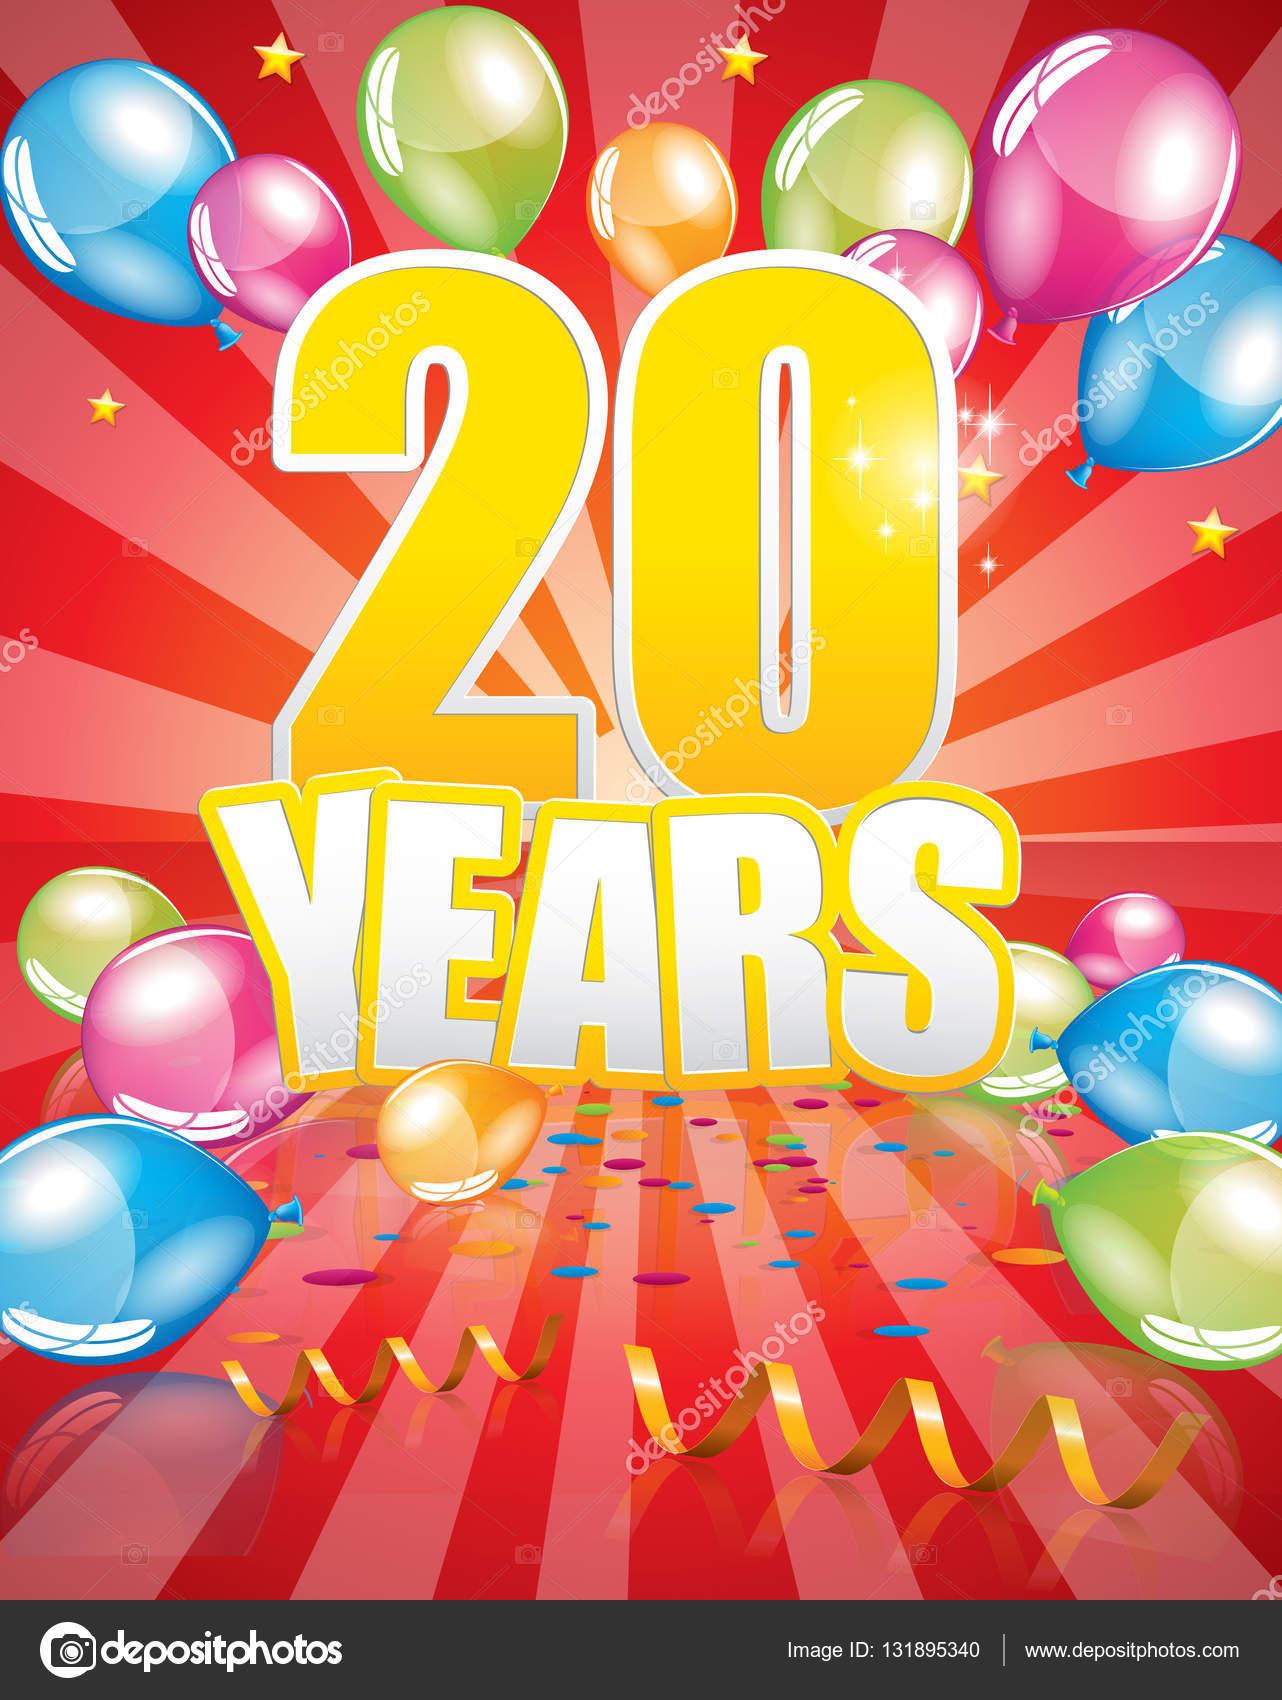 födelsedagskort 20 år 20 års födelsedagskort — Stock Vektor © Orkidia #131895340 födelsedagskort 20 år